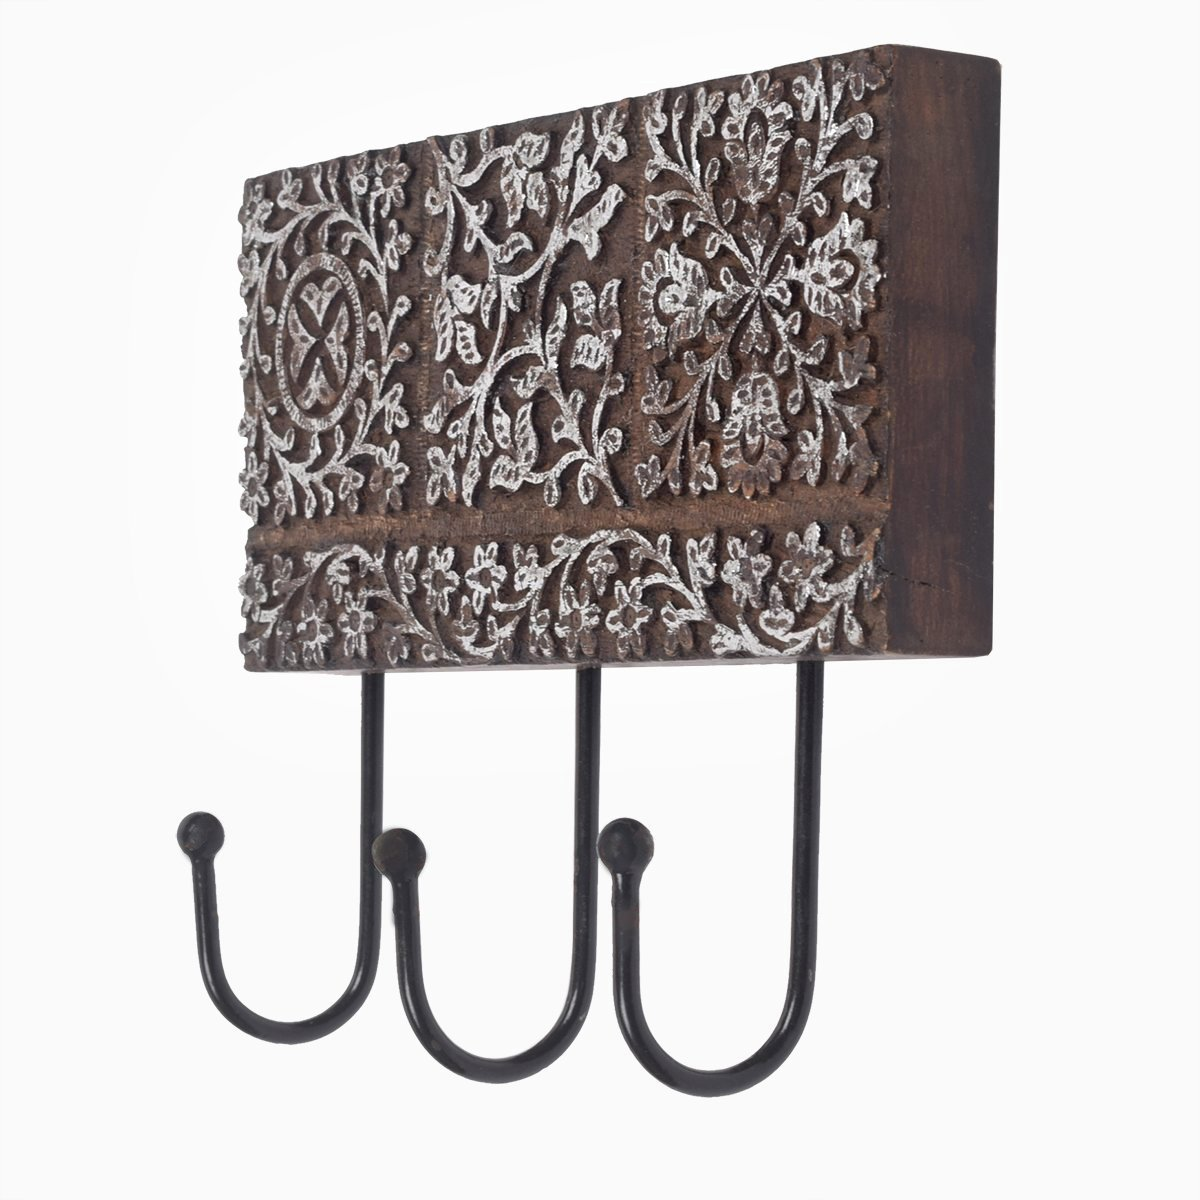 Vintage Wooden Hook Wall Hanger Coat Hooks Key Hat Scarf